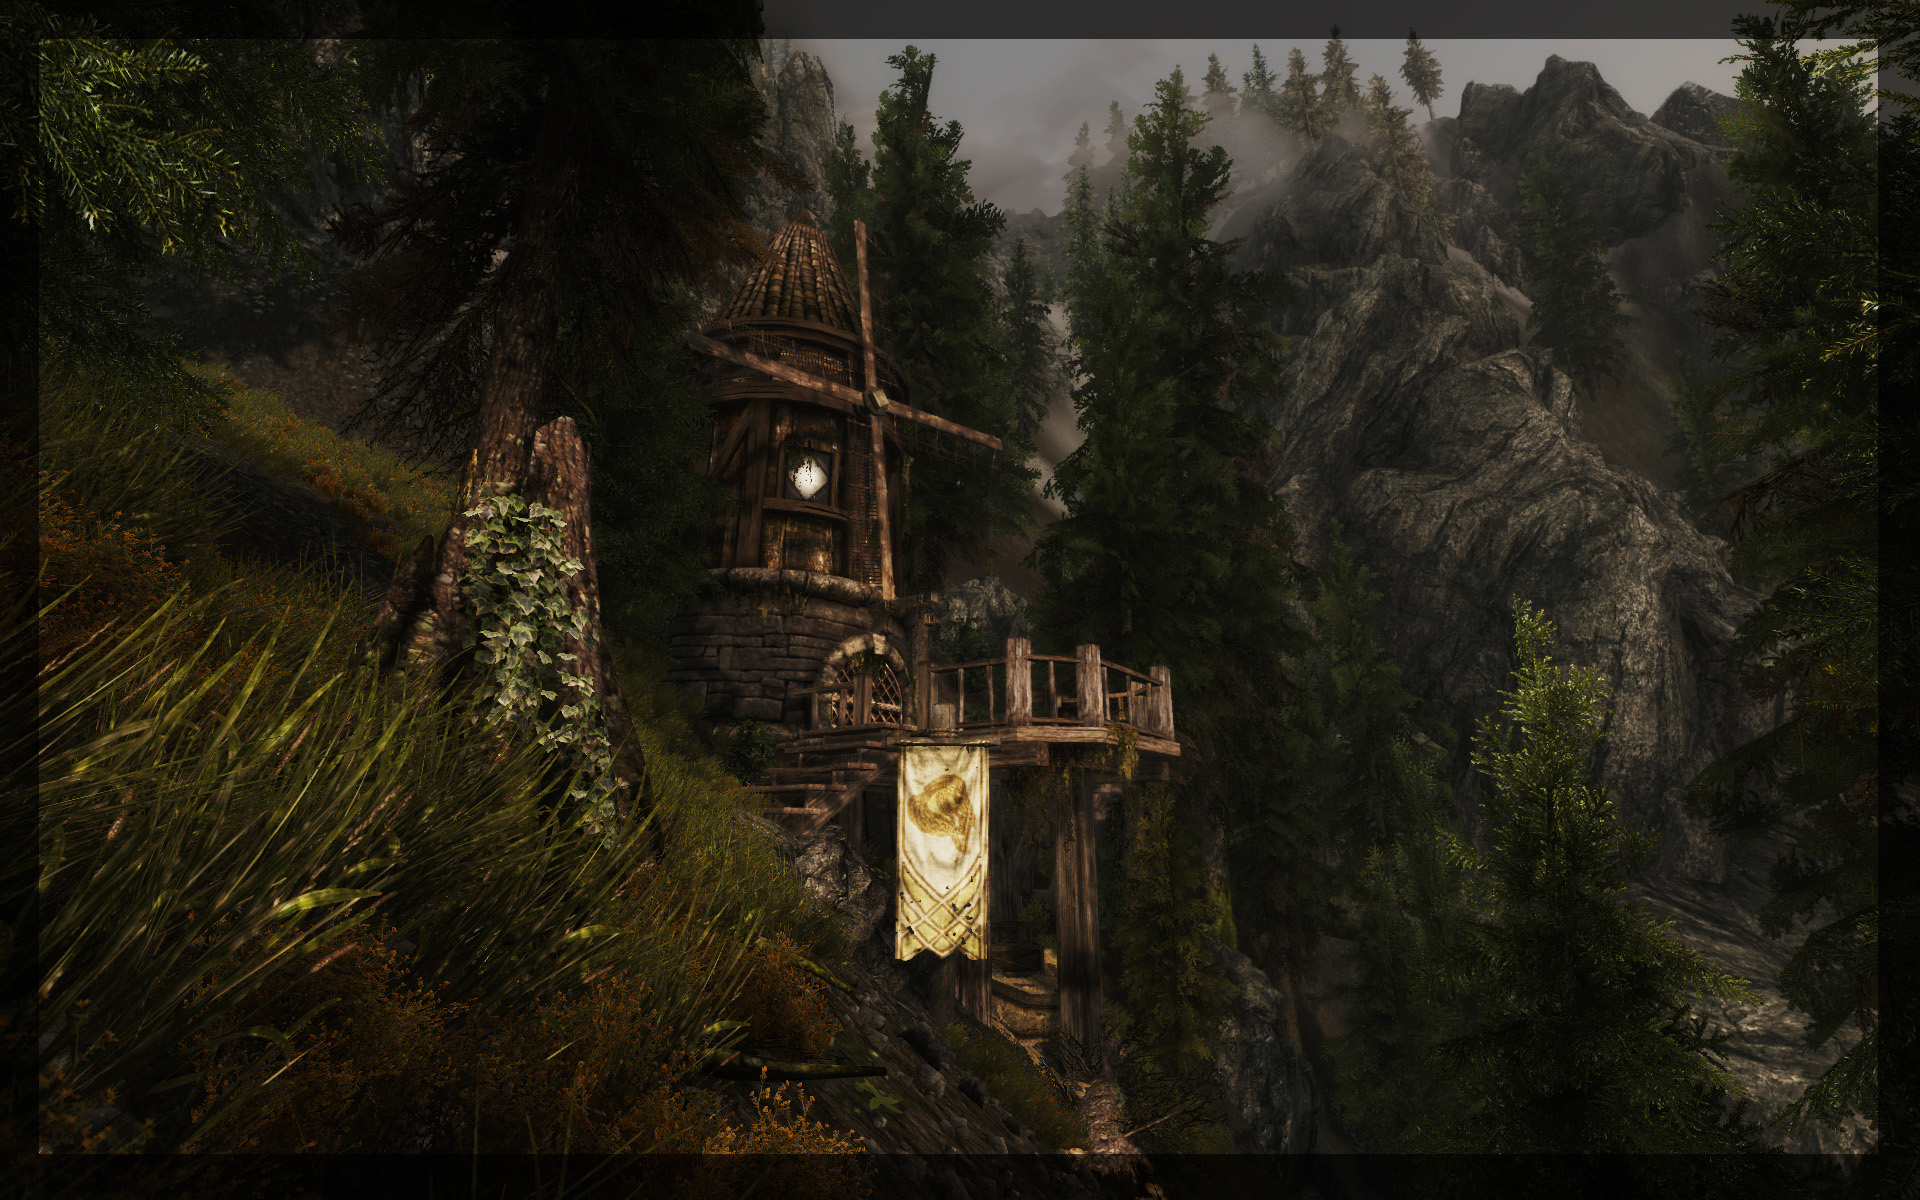 Forgotten Windmill